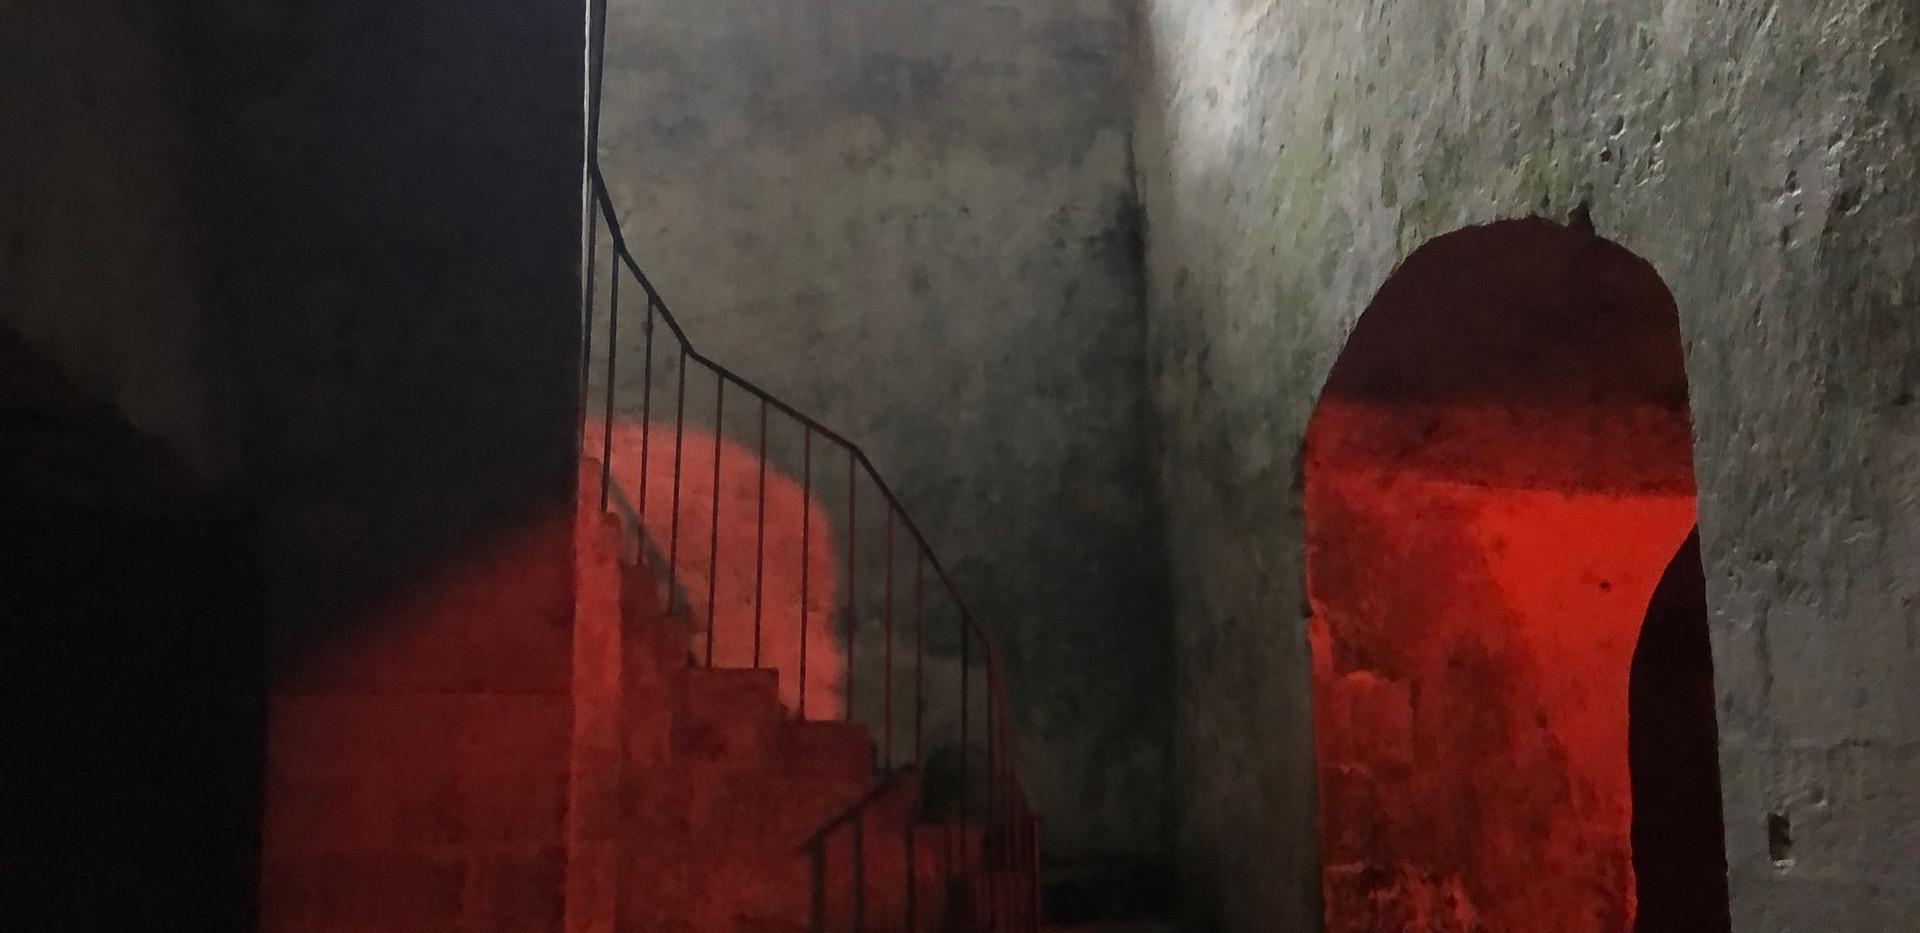 Deep in the cellars